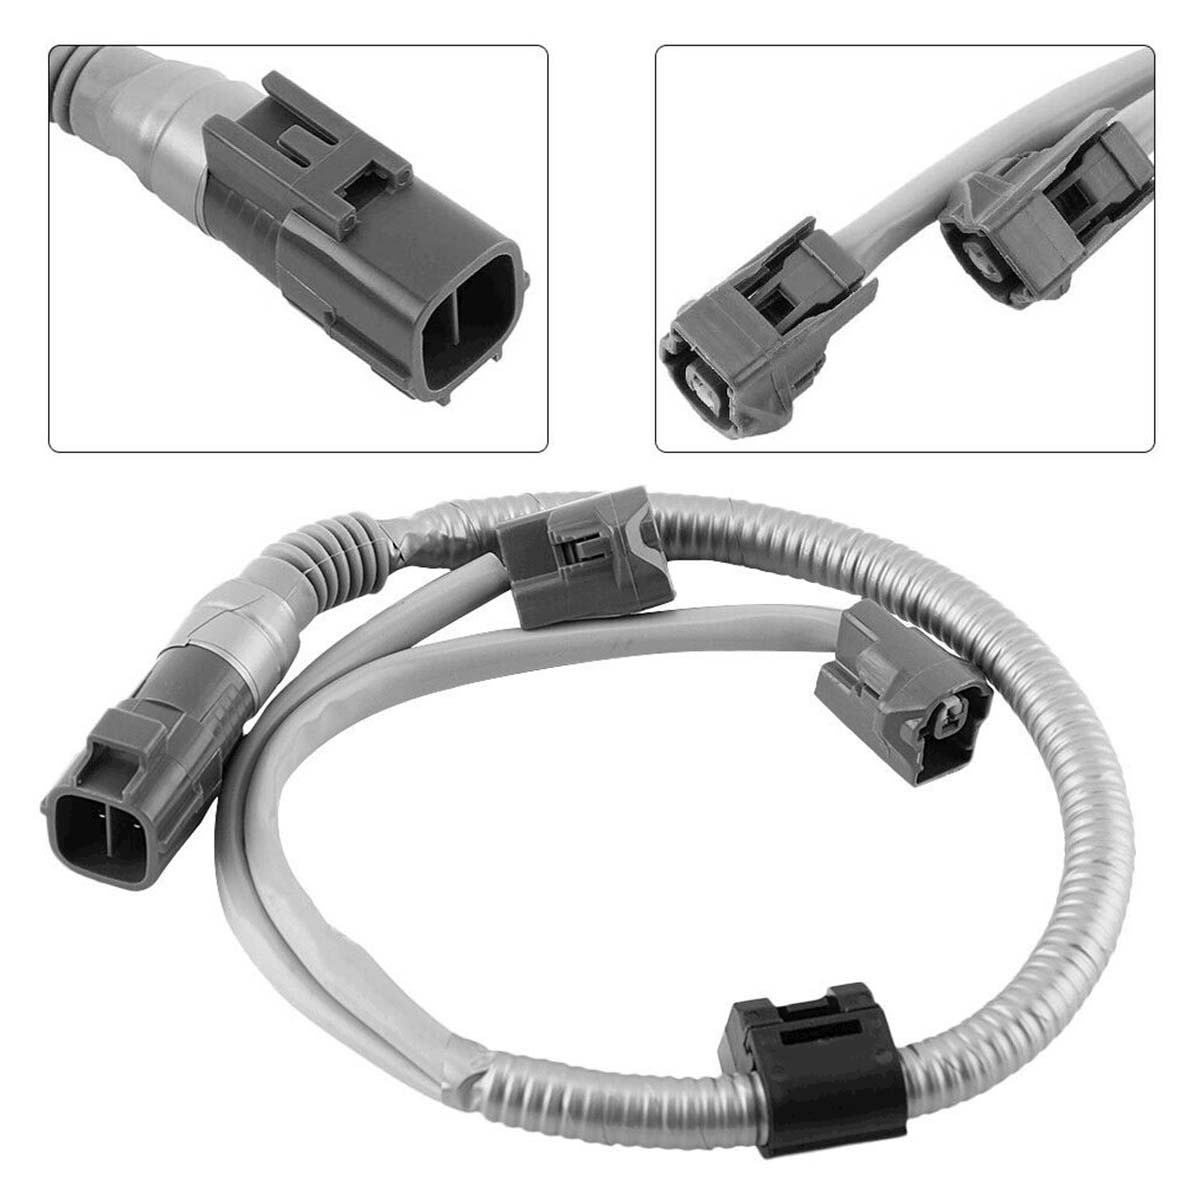 New Knock Sensor 89615  Harness For Solara Lexus Gs430 Ls430 Sc430 Rav4